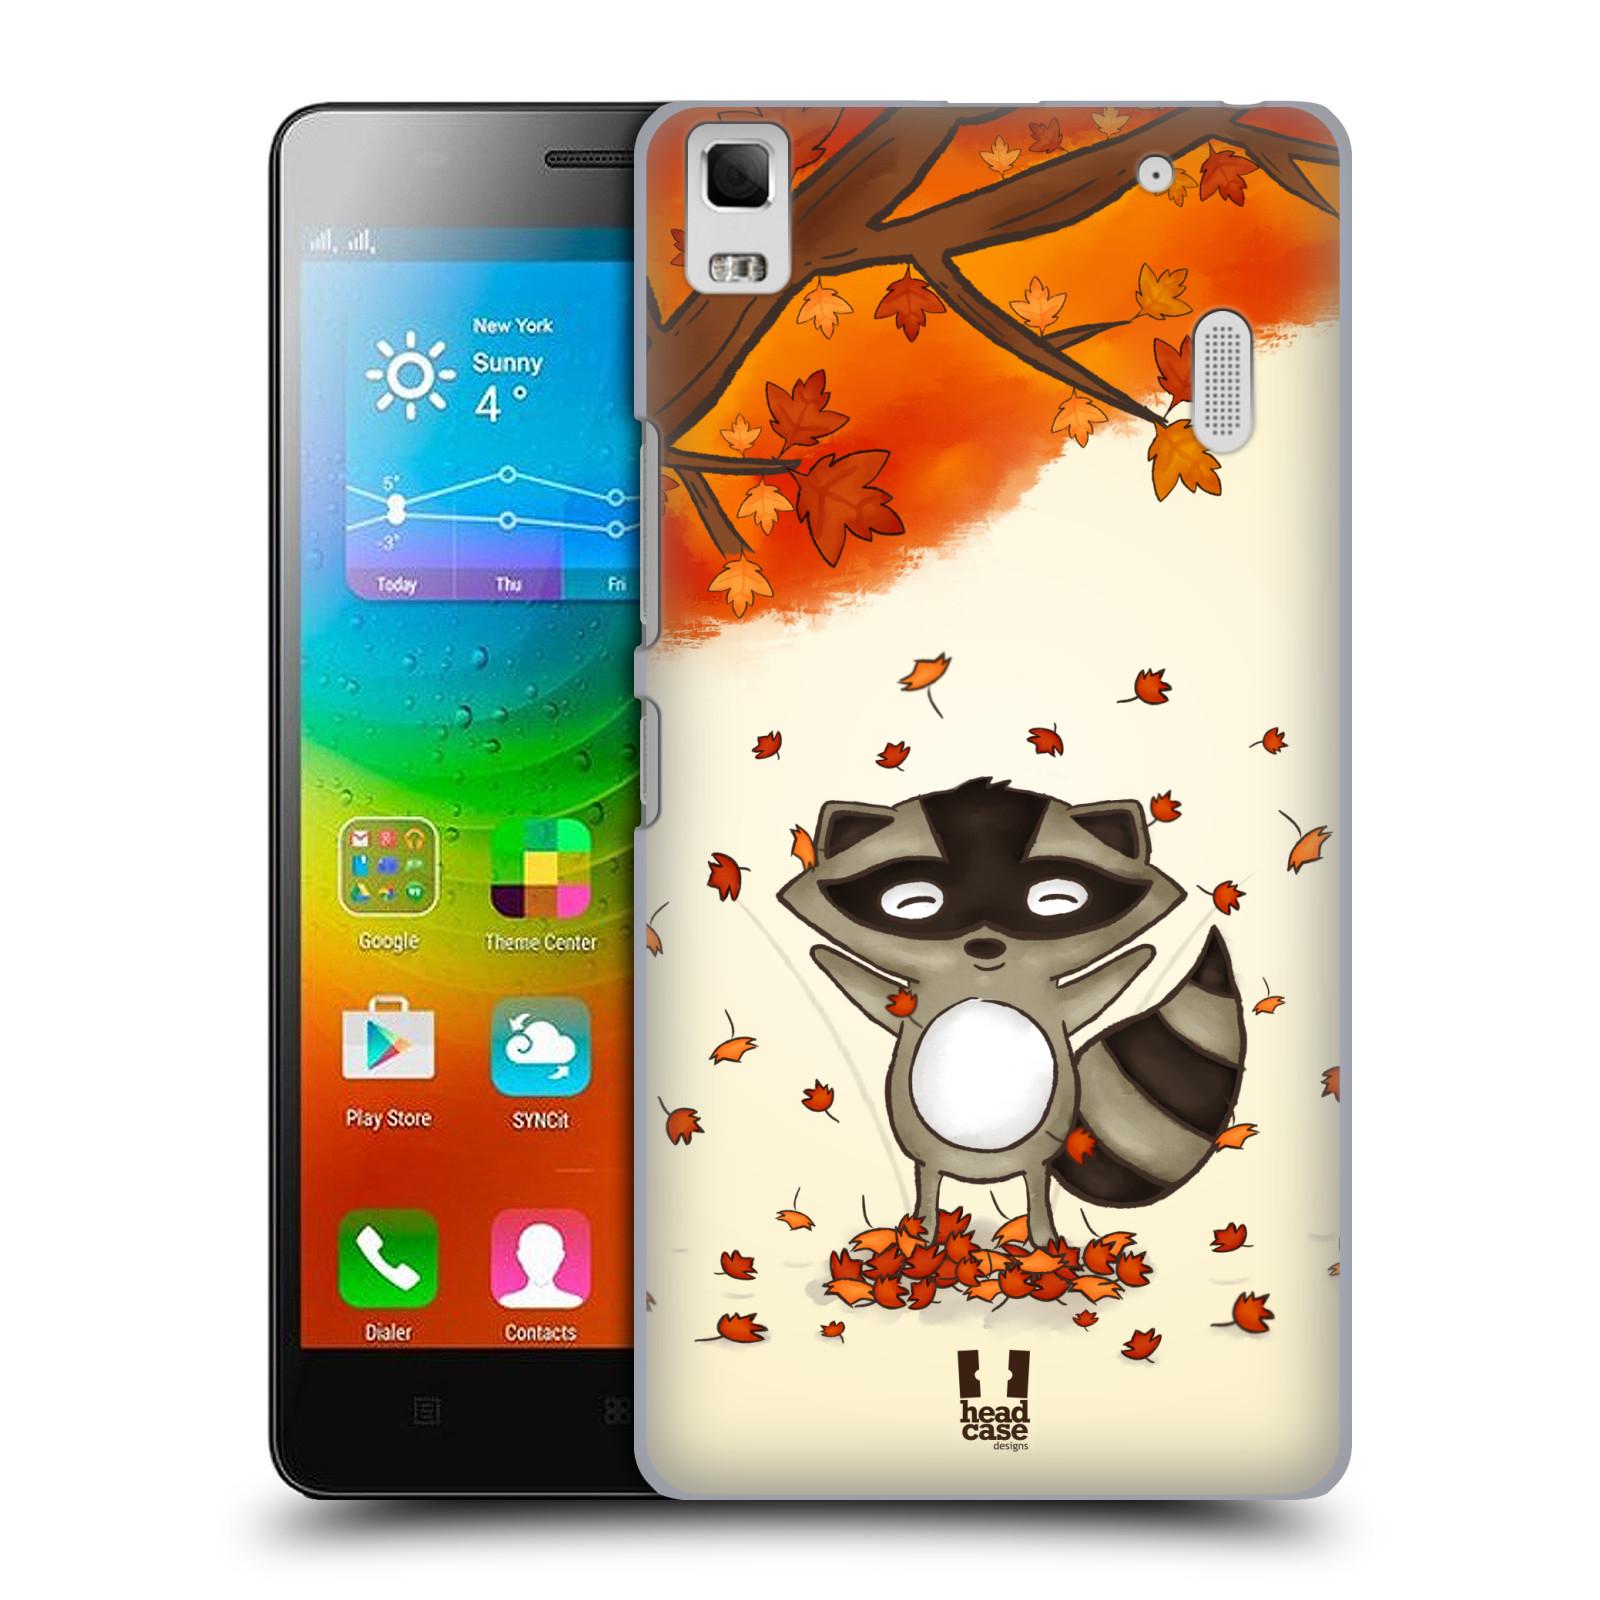 HEAD CASE pevný plastový obal na mobil LENOVO A7000 / A7000 DUAL / K3 NOTE vzor podzimní zvířátka mýval